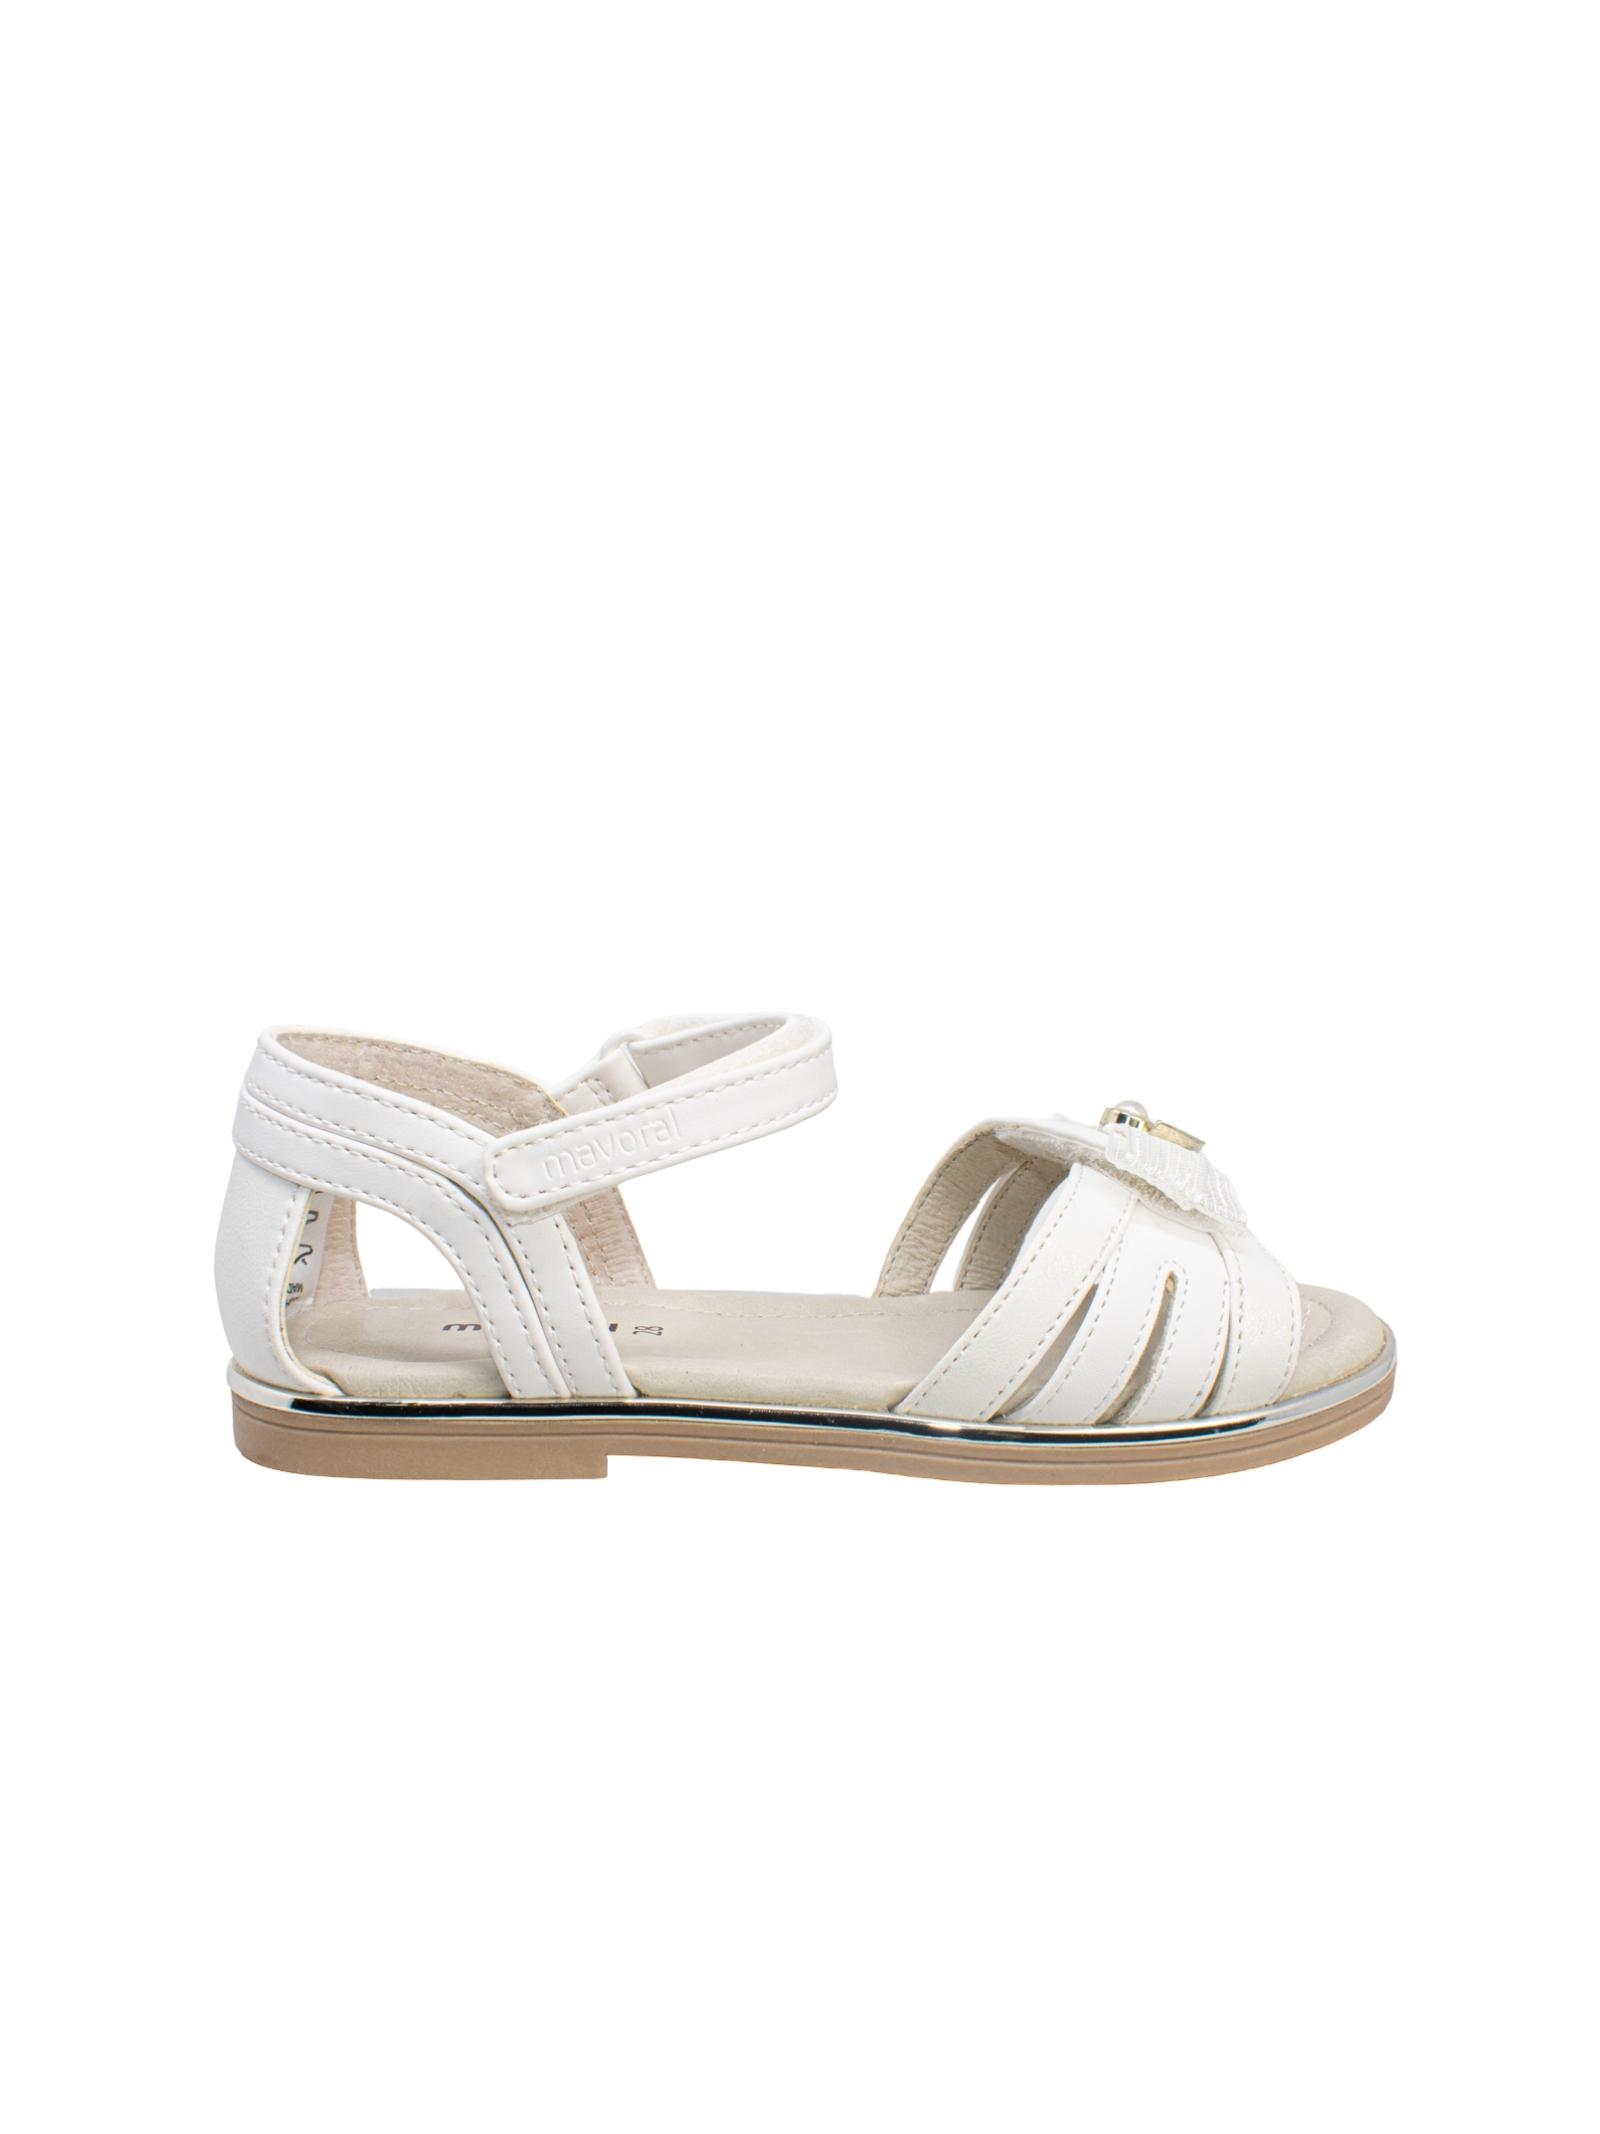 Sandalo Fiocco Elegant MAYORAL | Sandali | 45265019